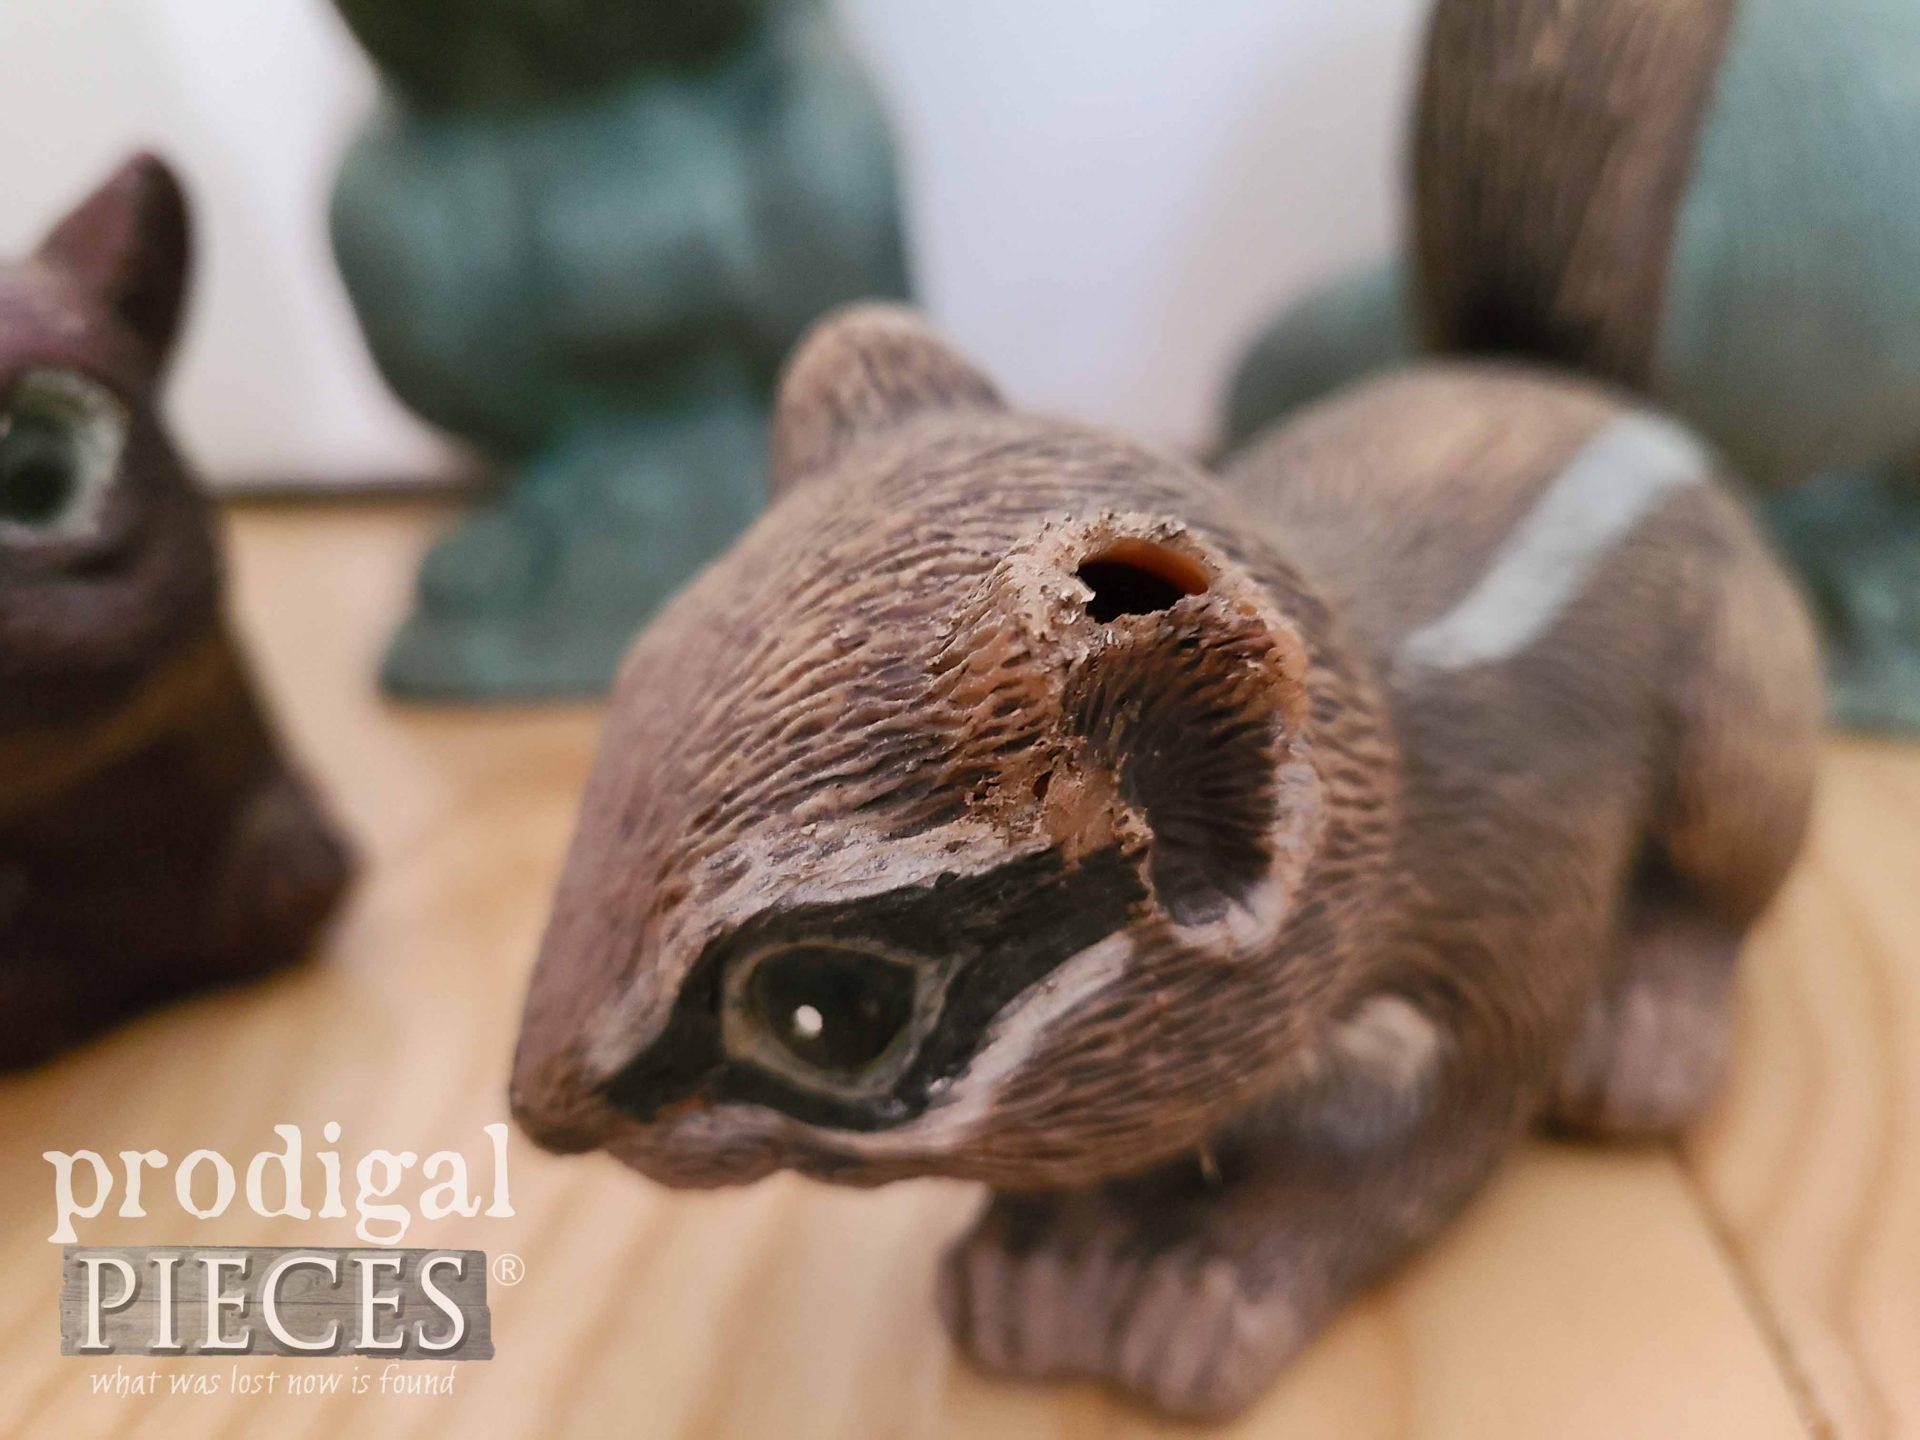 Damaged Chipmunk Sculpture | prodigalpieces.com